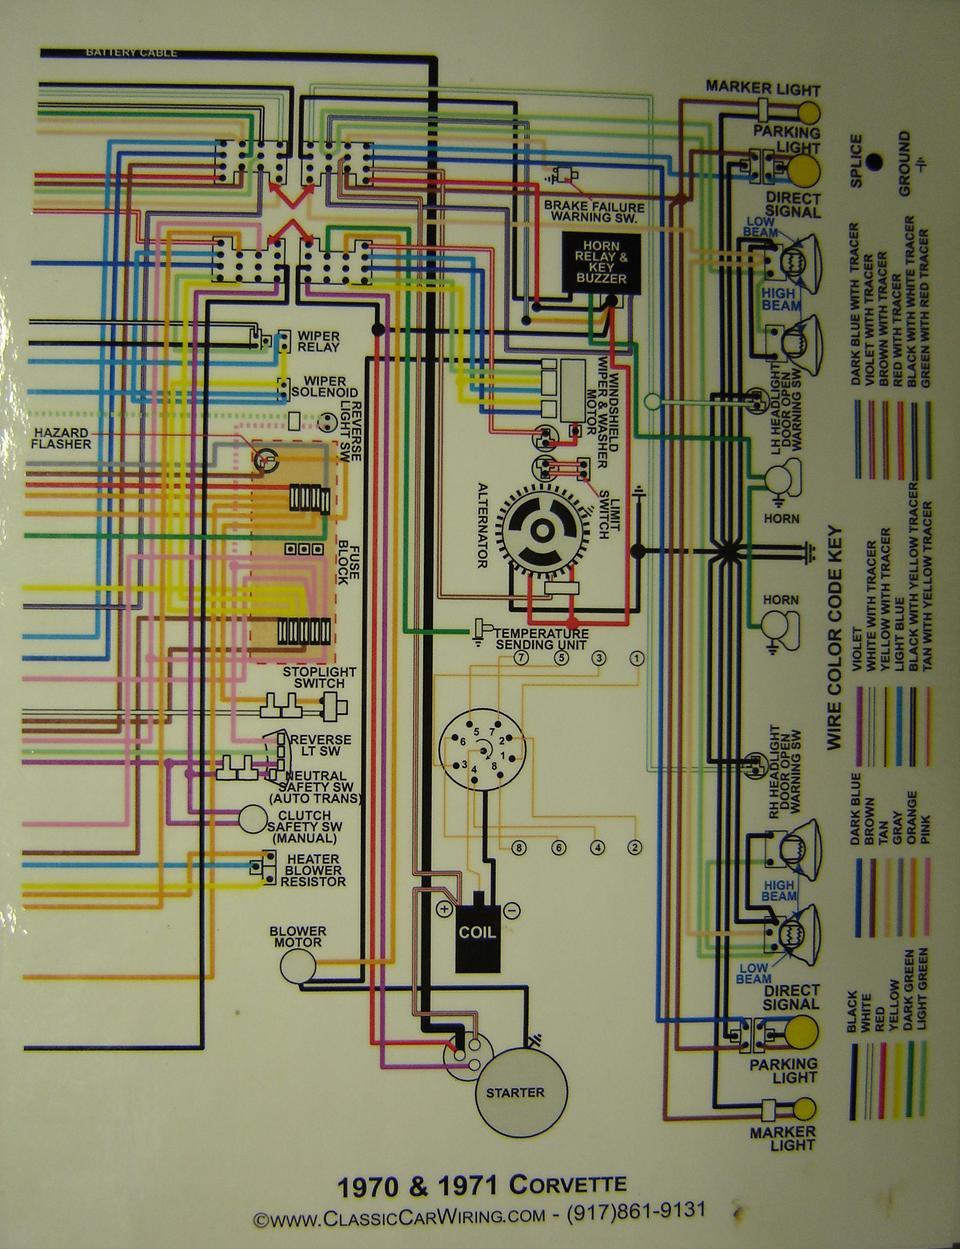 71 Chevelle Dash Wiring Diagram Efcaviation Com Chevy Steering Column Wiring Diagram 71 Chevelle Wiring Diagrams & 71 Chevelle Wiring Diagrams - free download wiring diagrams schematics jdmop.com